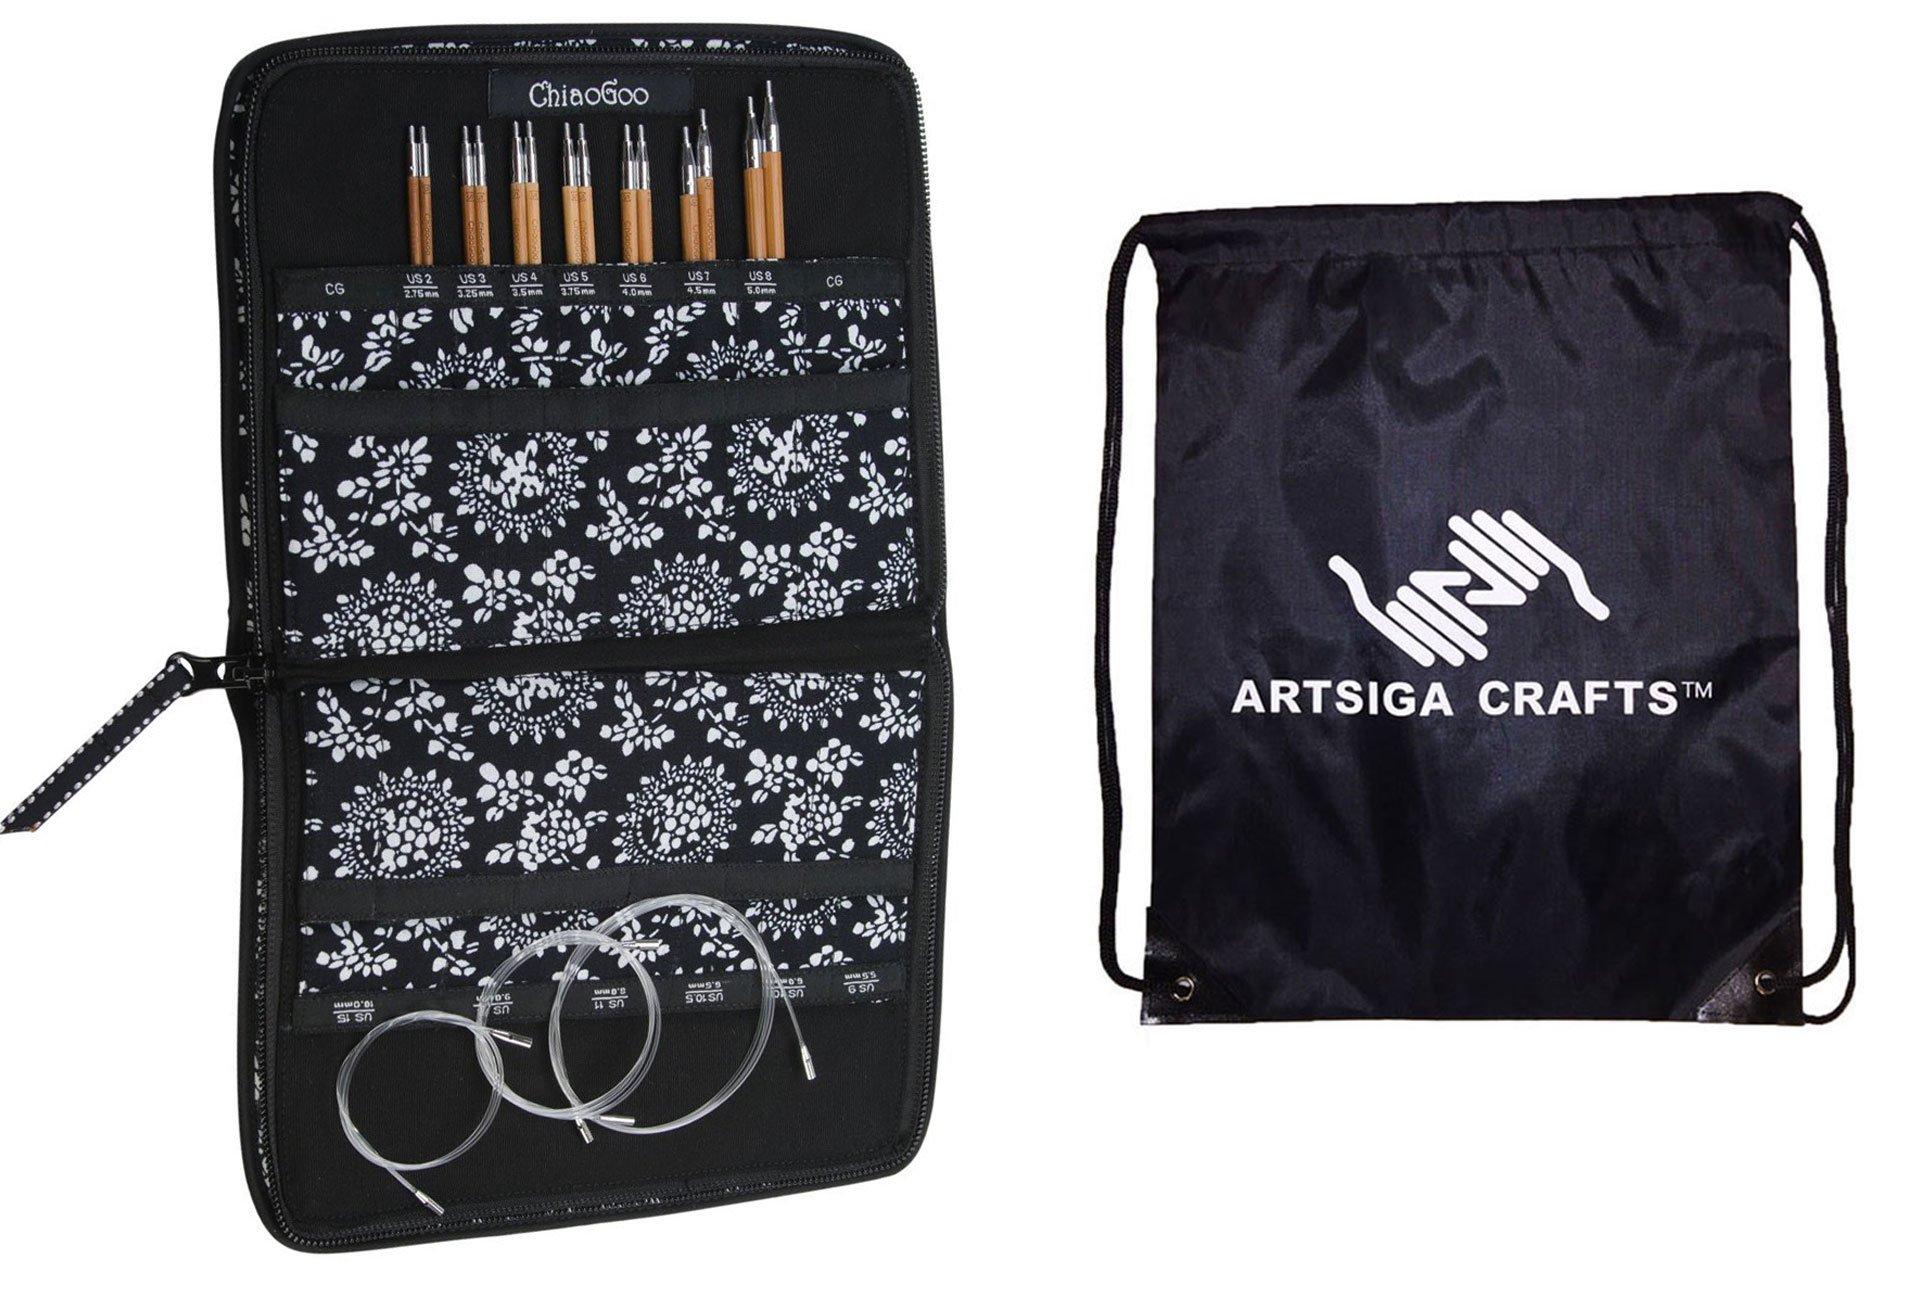 ChiaoGoo Spin Interchangeable Knitting Needle Set Small Needles: Size US 2 (2.75mm)-Size US 8 (5mm) Bundle with 1 Artsiga Crafts Project Bag 2500-S by ChiaoGoo Knitting Needles (Image #1)